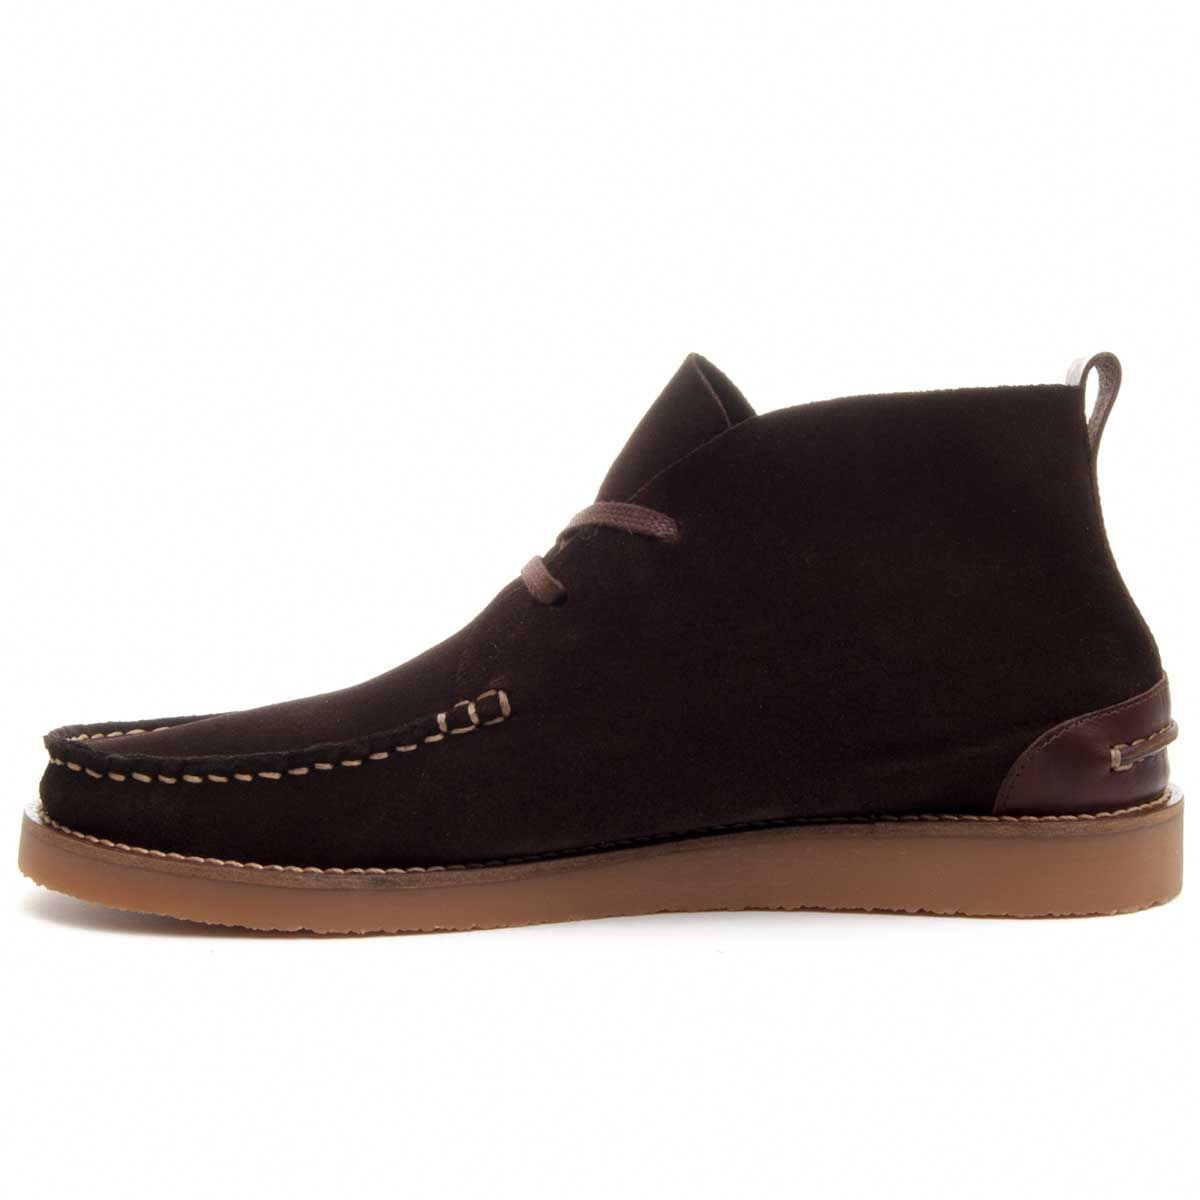 Purapiel Chukka Boot in Brown